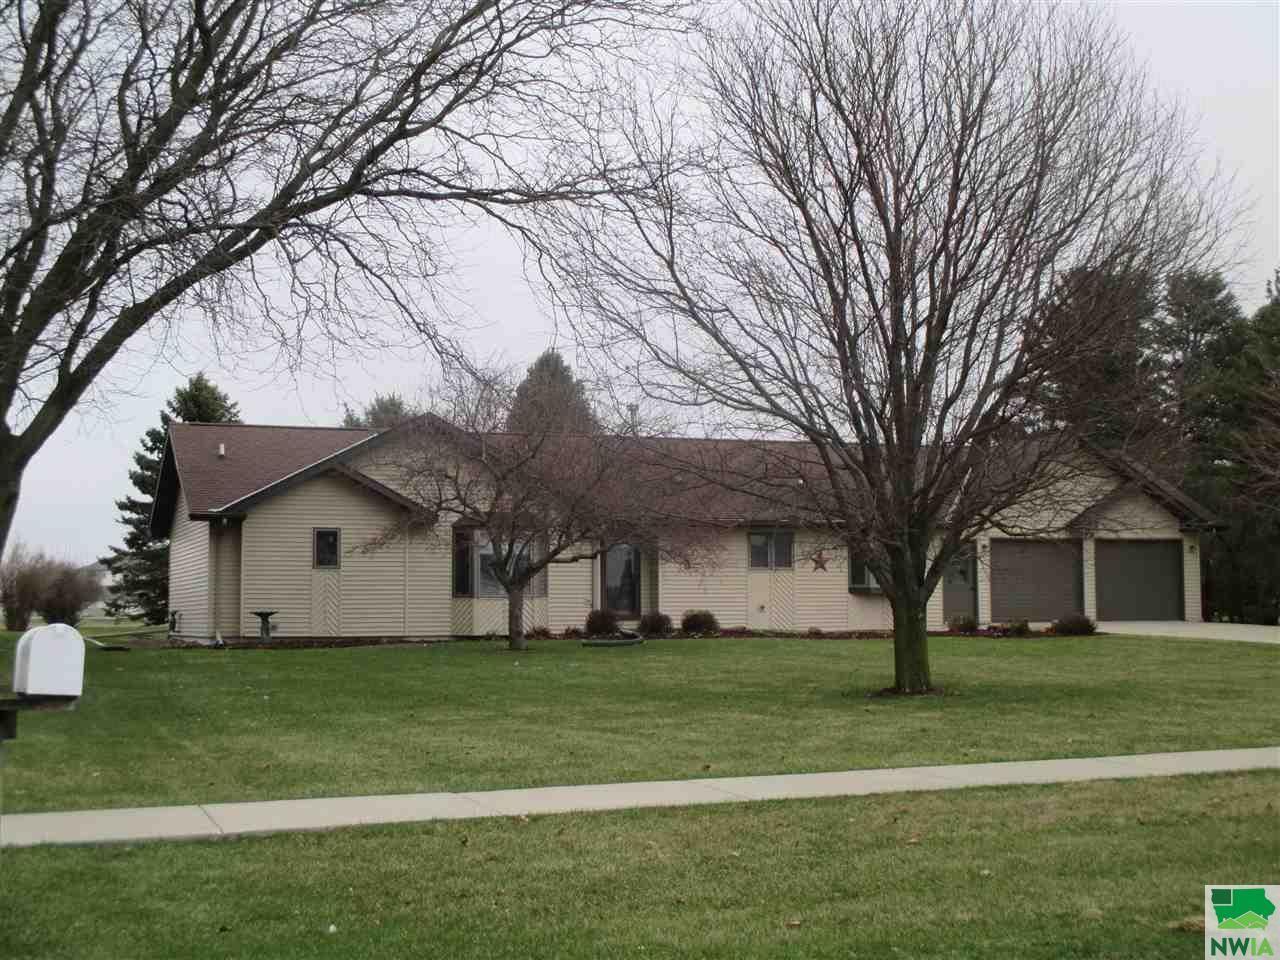 Photo for 415 Country Club, Sheldon, IA 51201 (MLS # 807427)